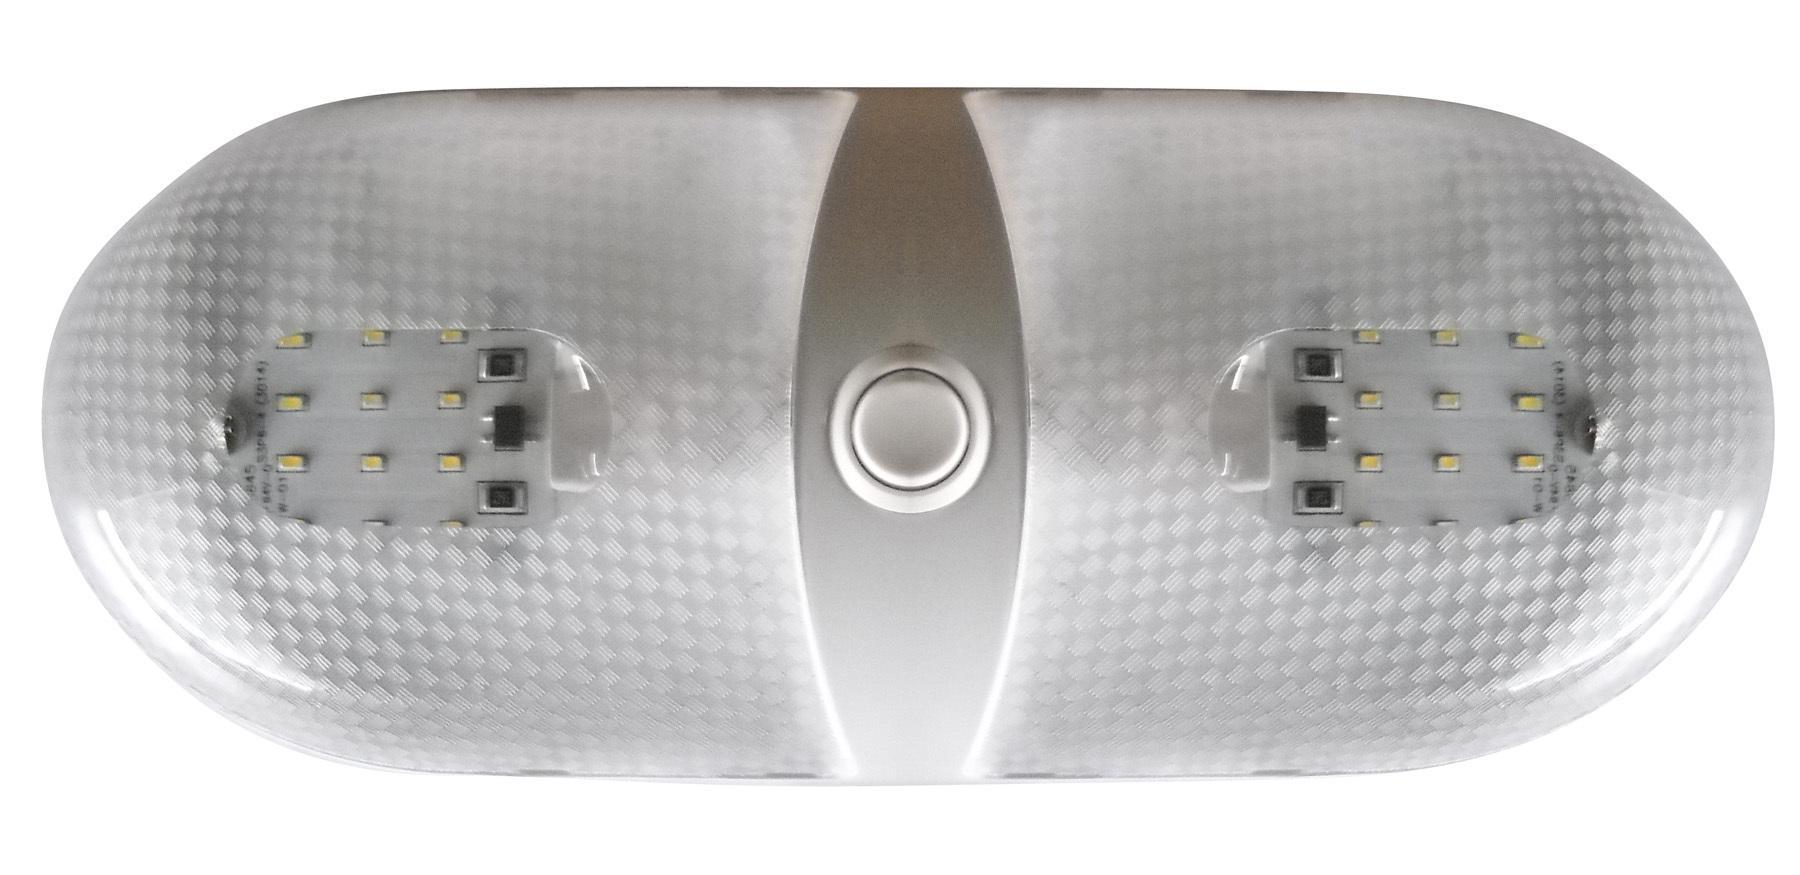 Double Pancake LED Fixture - Warm White 52430-ww